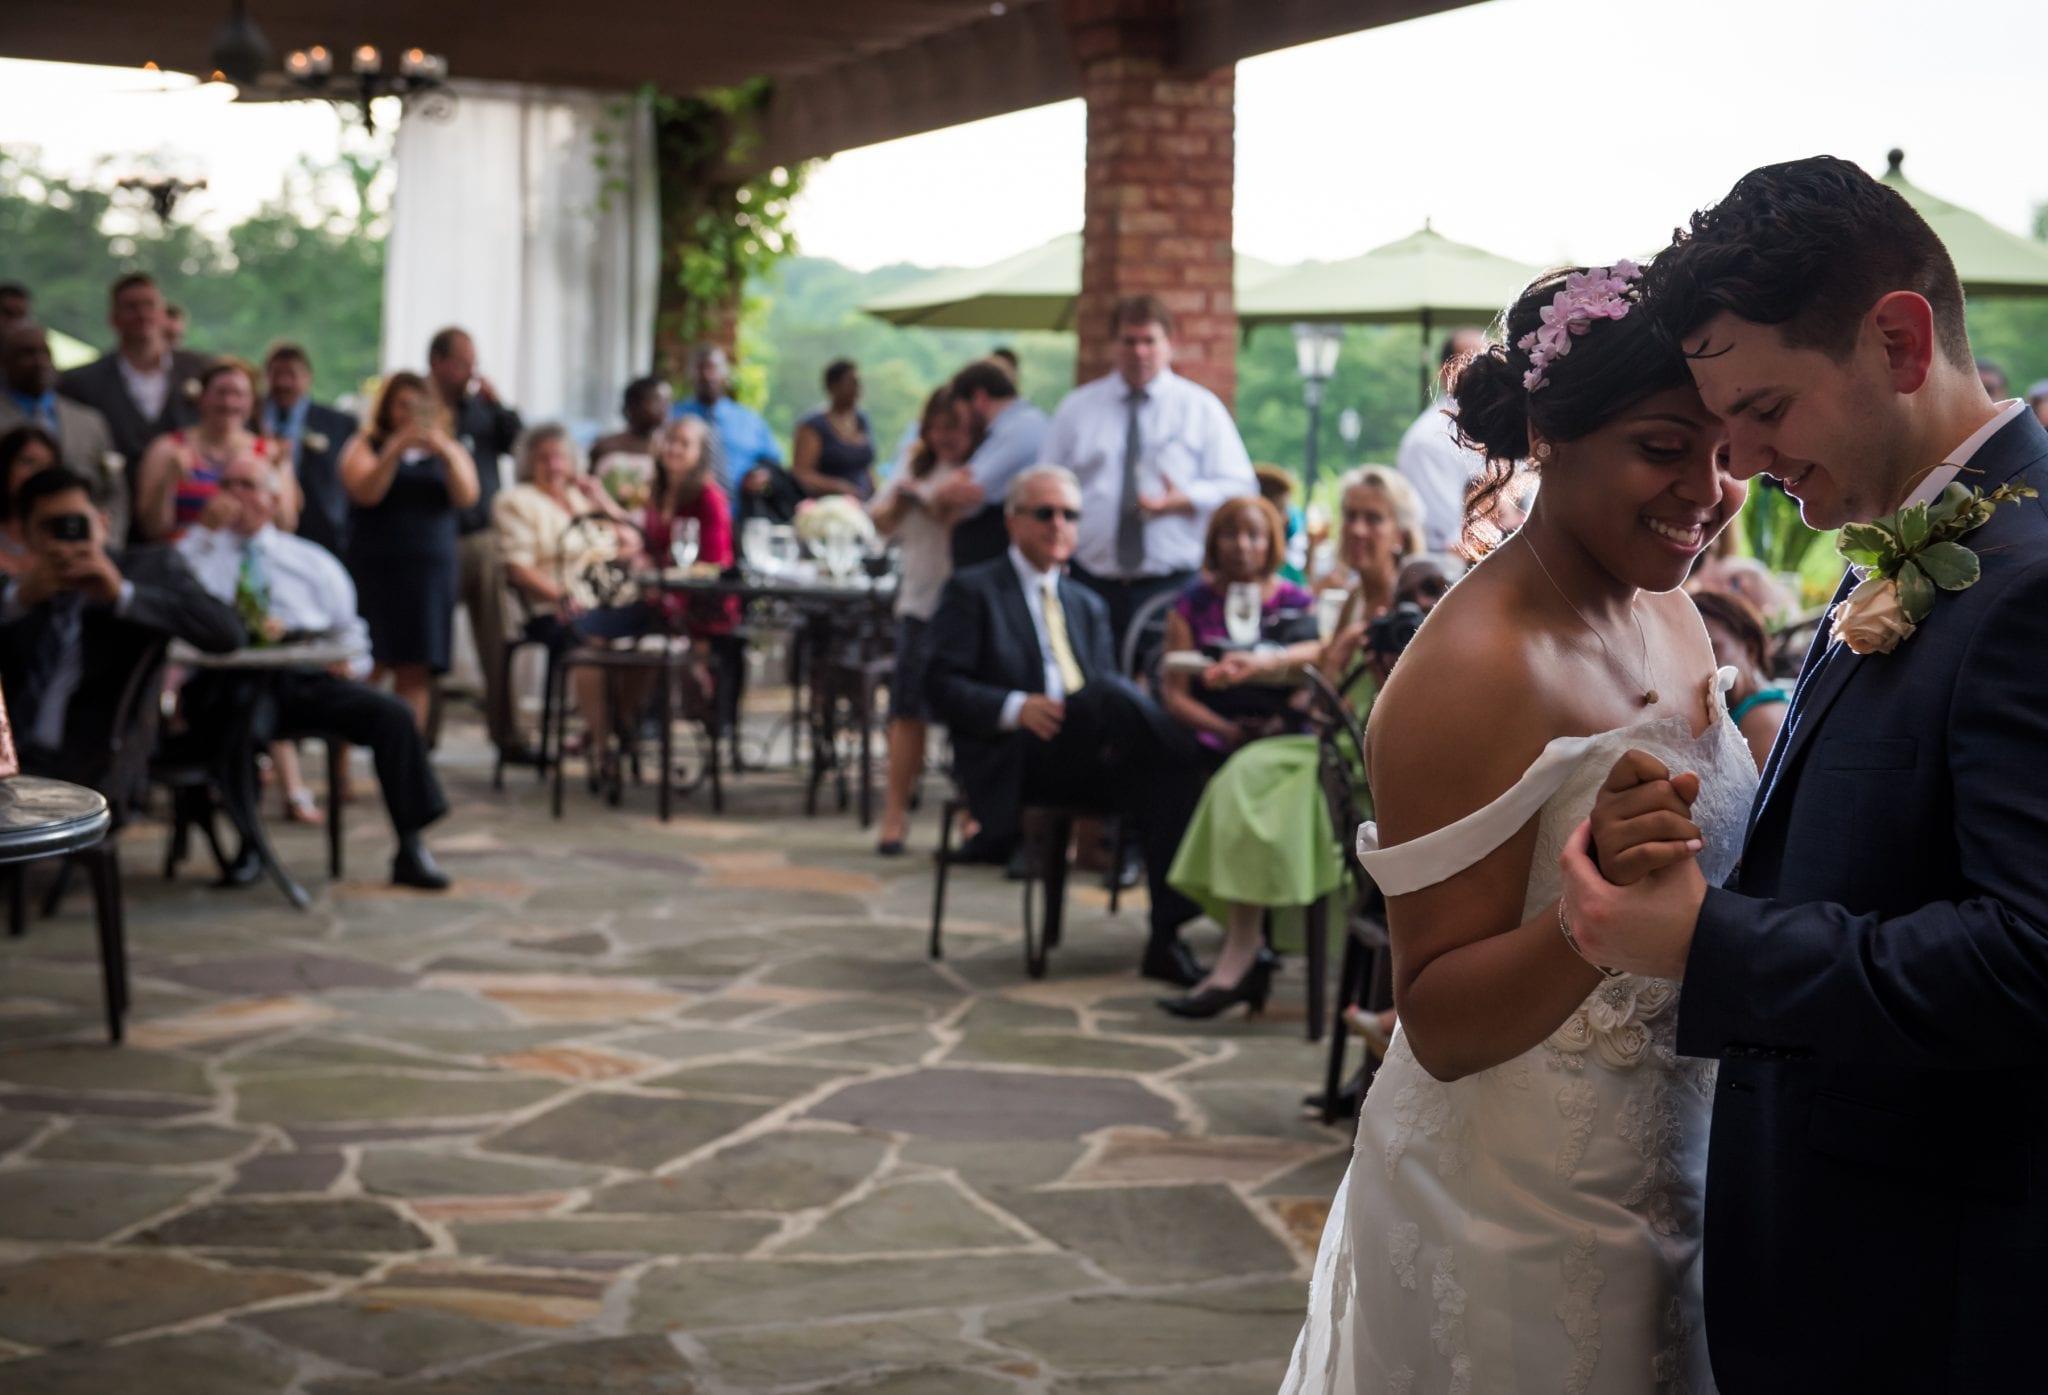 Northern Virginia June Winery Wedding - potomacpointwinery.com